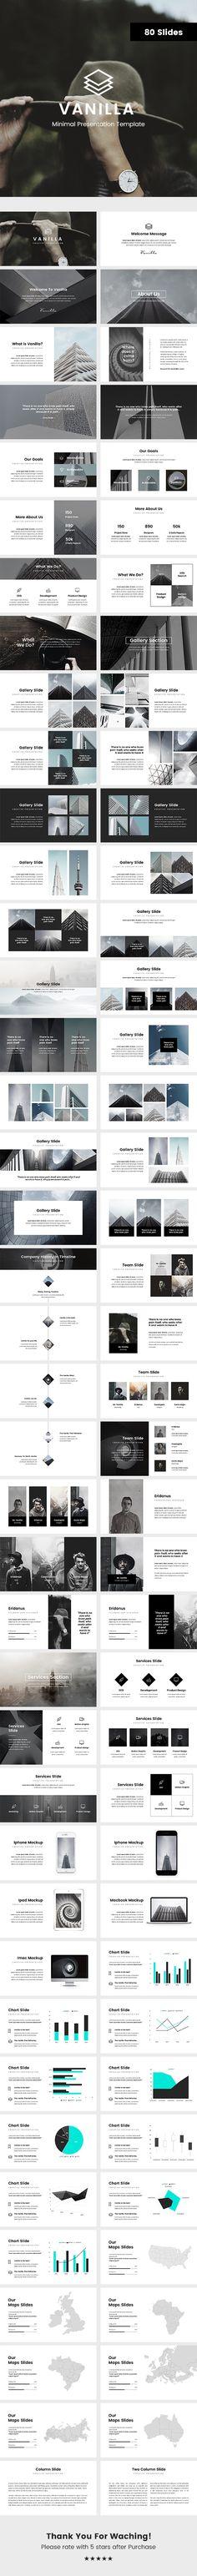 Vanilla Minimal Keynote Template  #infographic #portfolio • Download ➝ https://graphicriver.net/item/vanilla-minimal-keynote-template/18162605?ref=pxcr